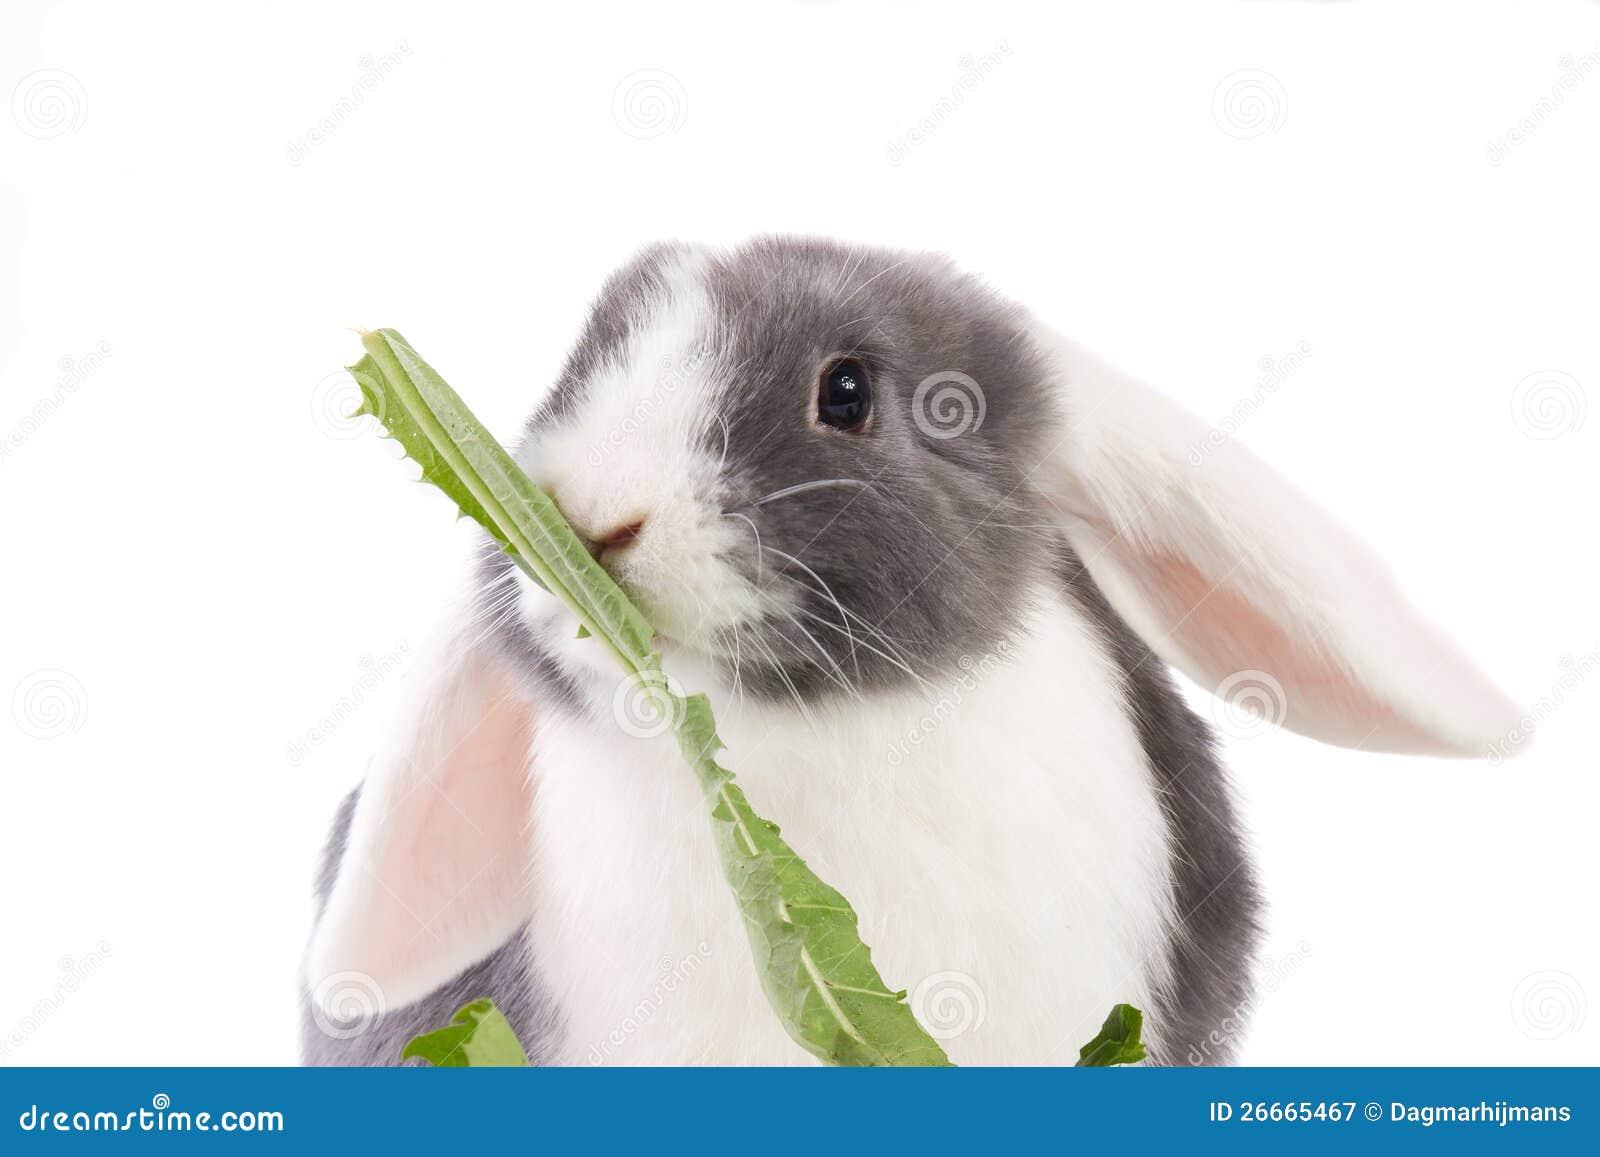 hur du koppla in kanin öron